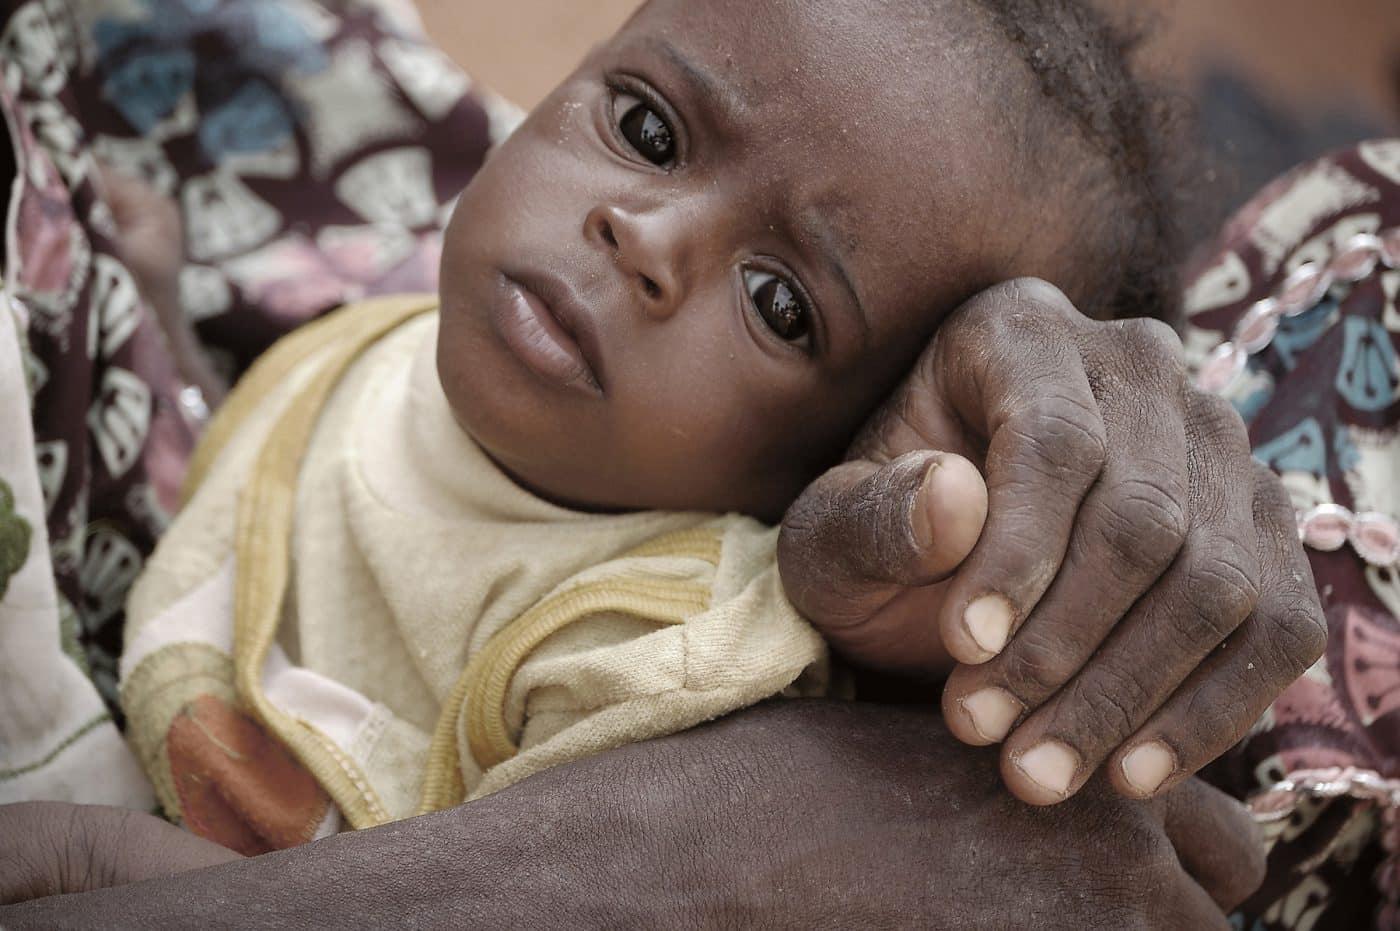 Underernæret barn fra Niger. Foto: Julie Lorenzen.jpg